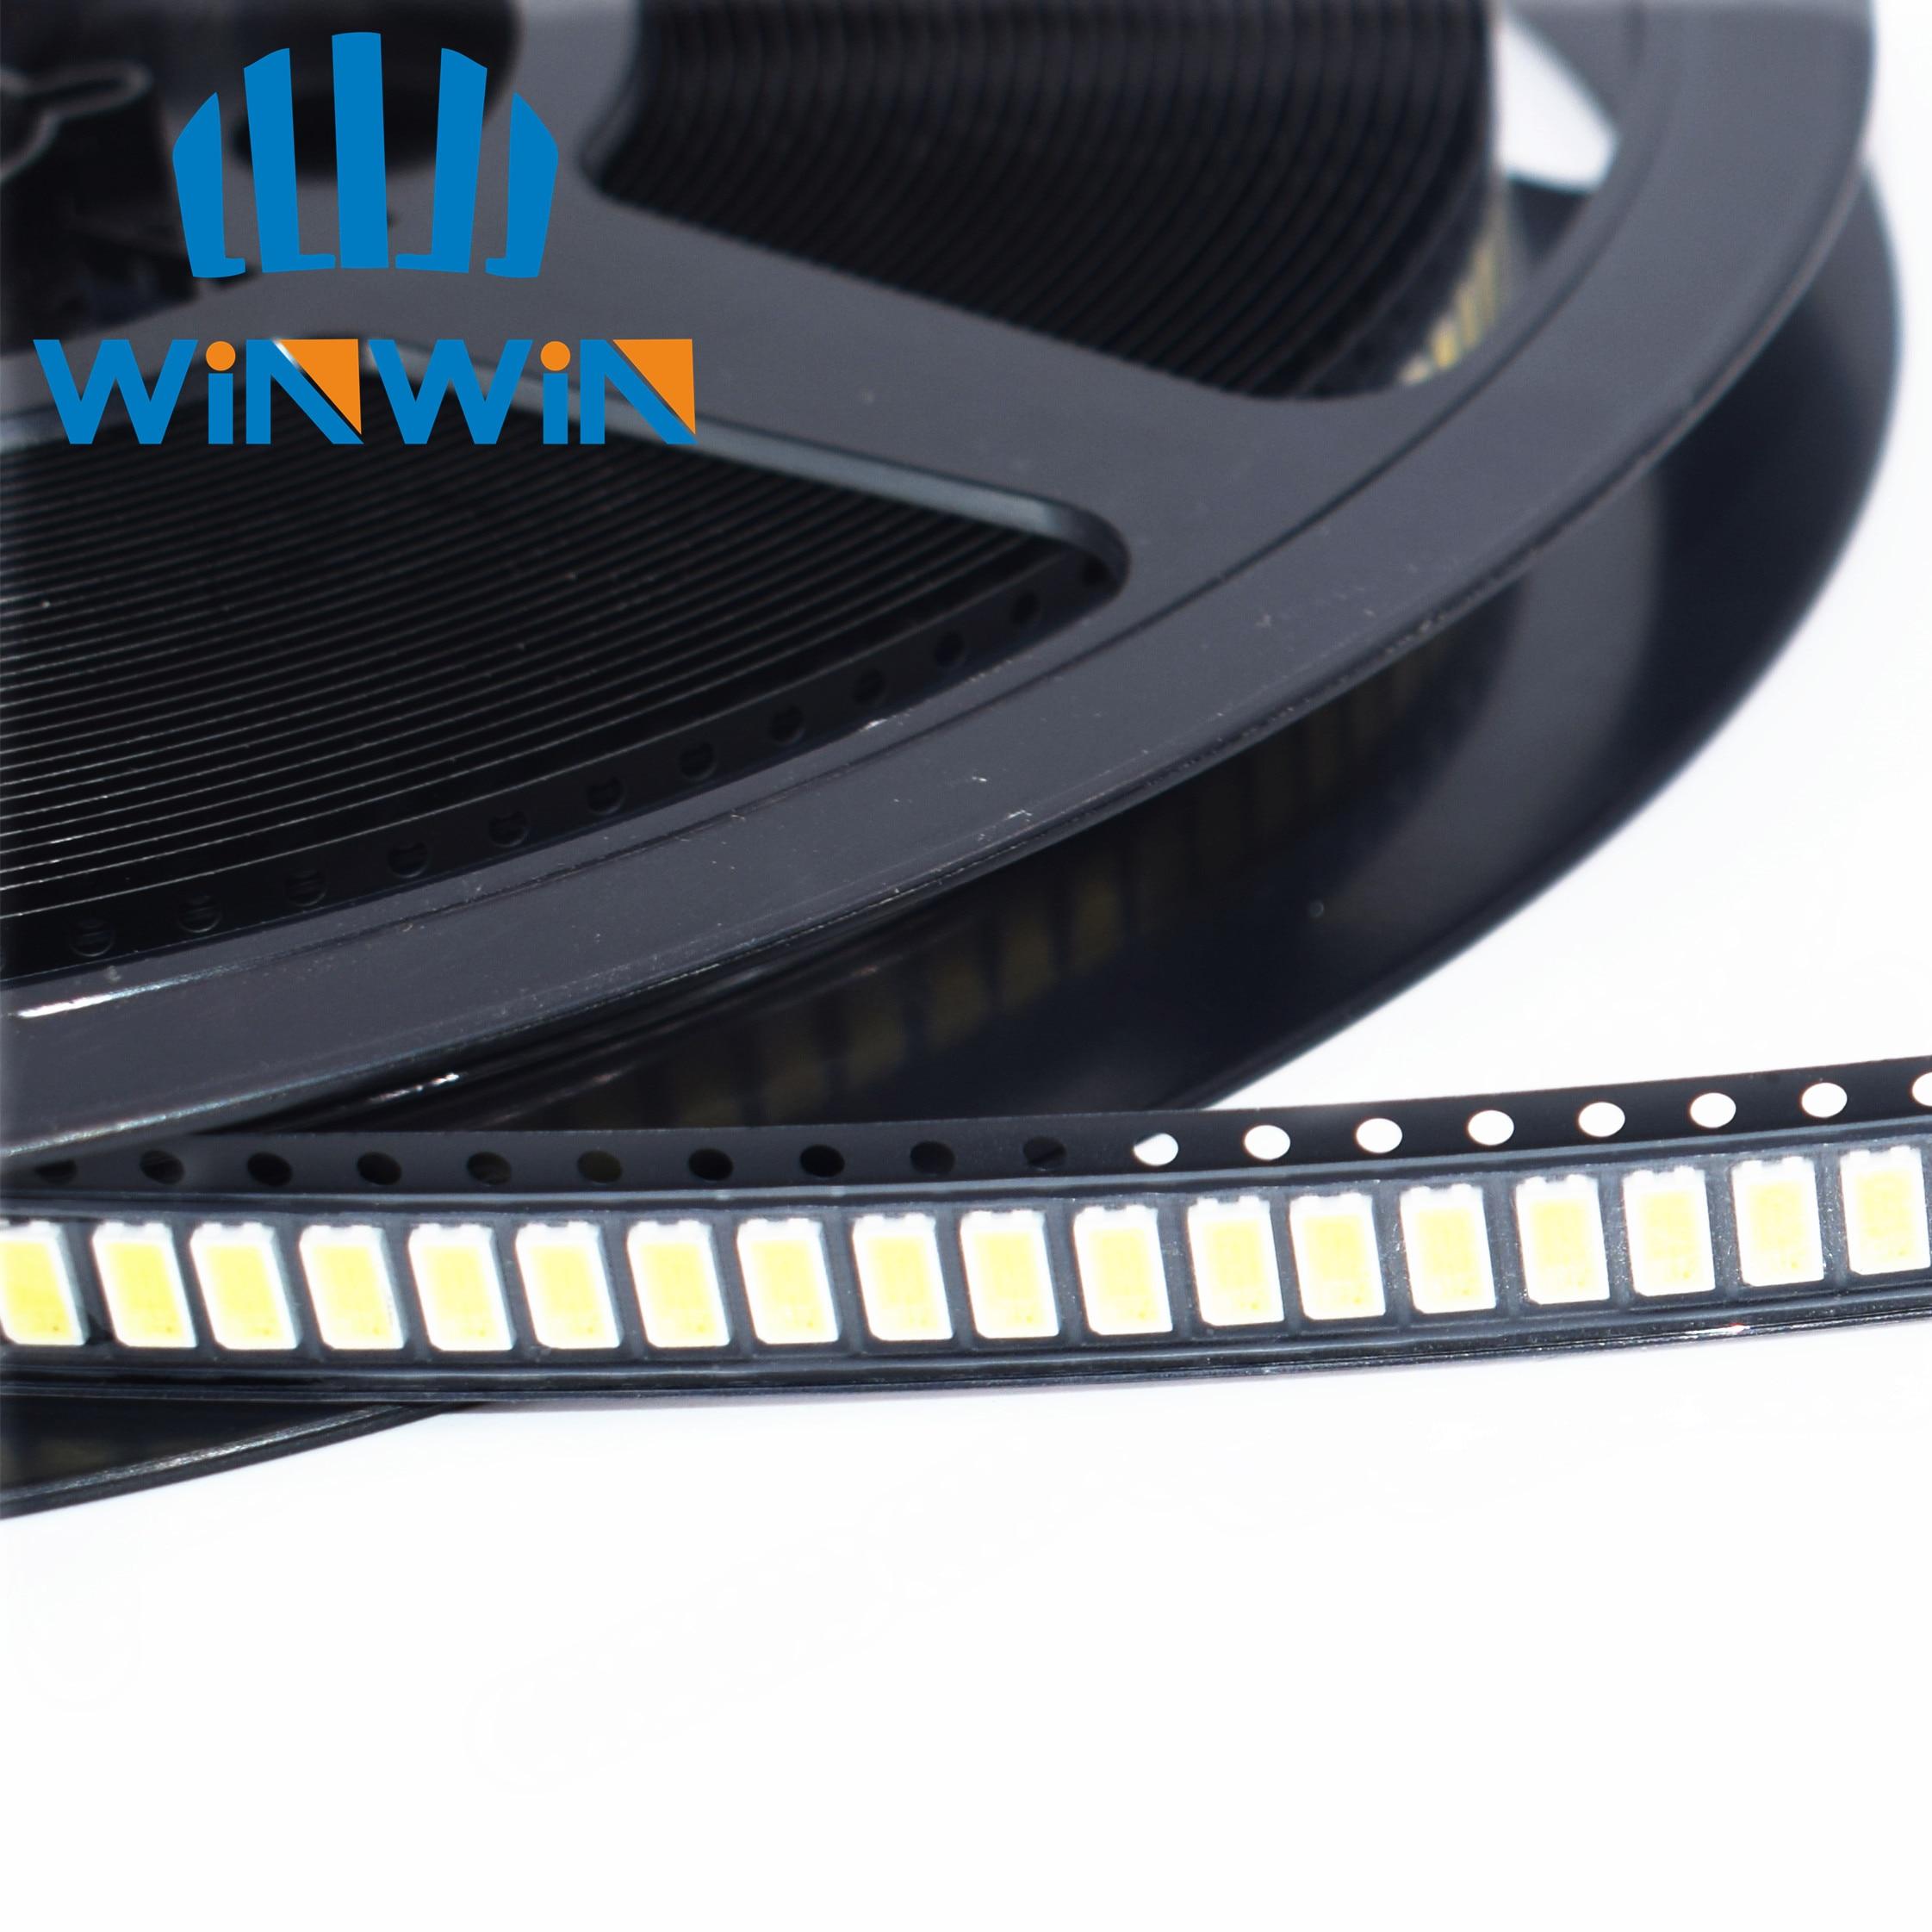 200PCS For SAMSUNG LED Backlight 0.5W 3v 5630 Cool white LCD Backlight for TV TV Application SPBWH1532S1ZVC1BIB